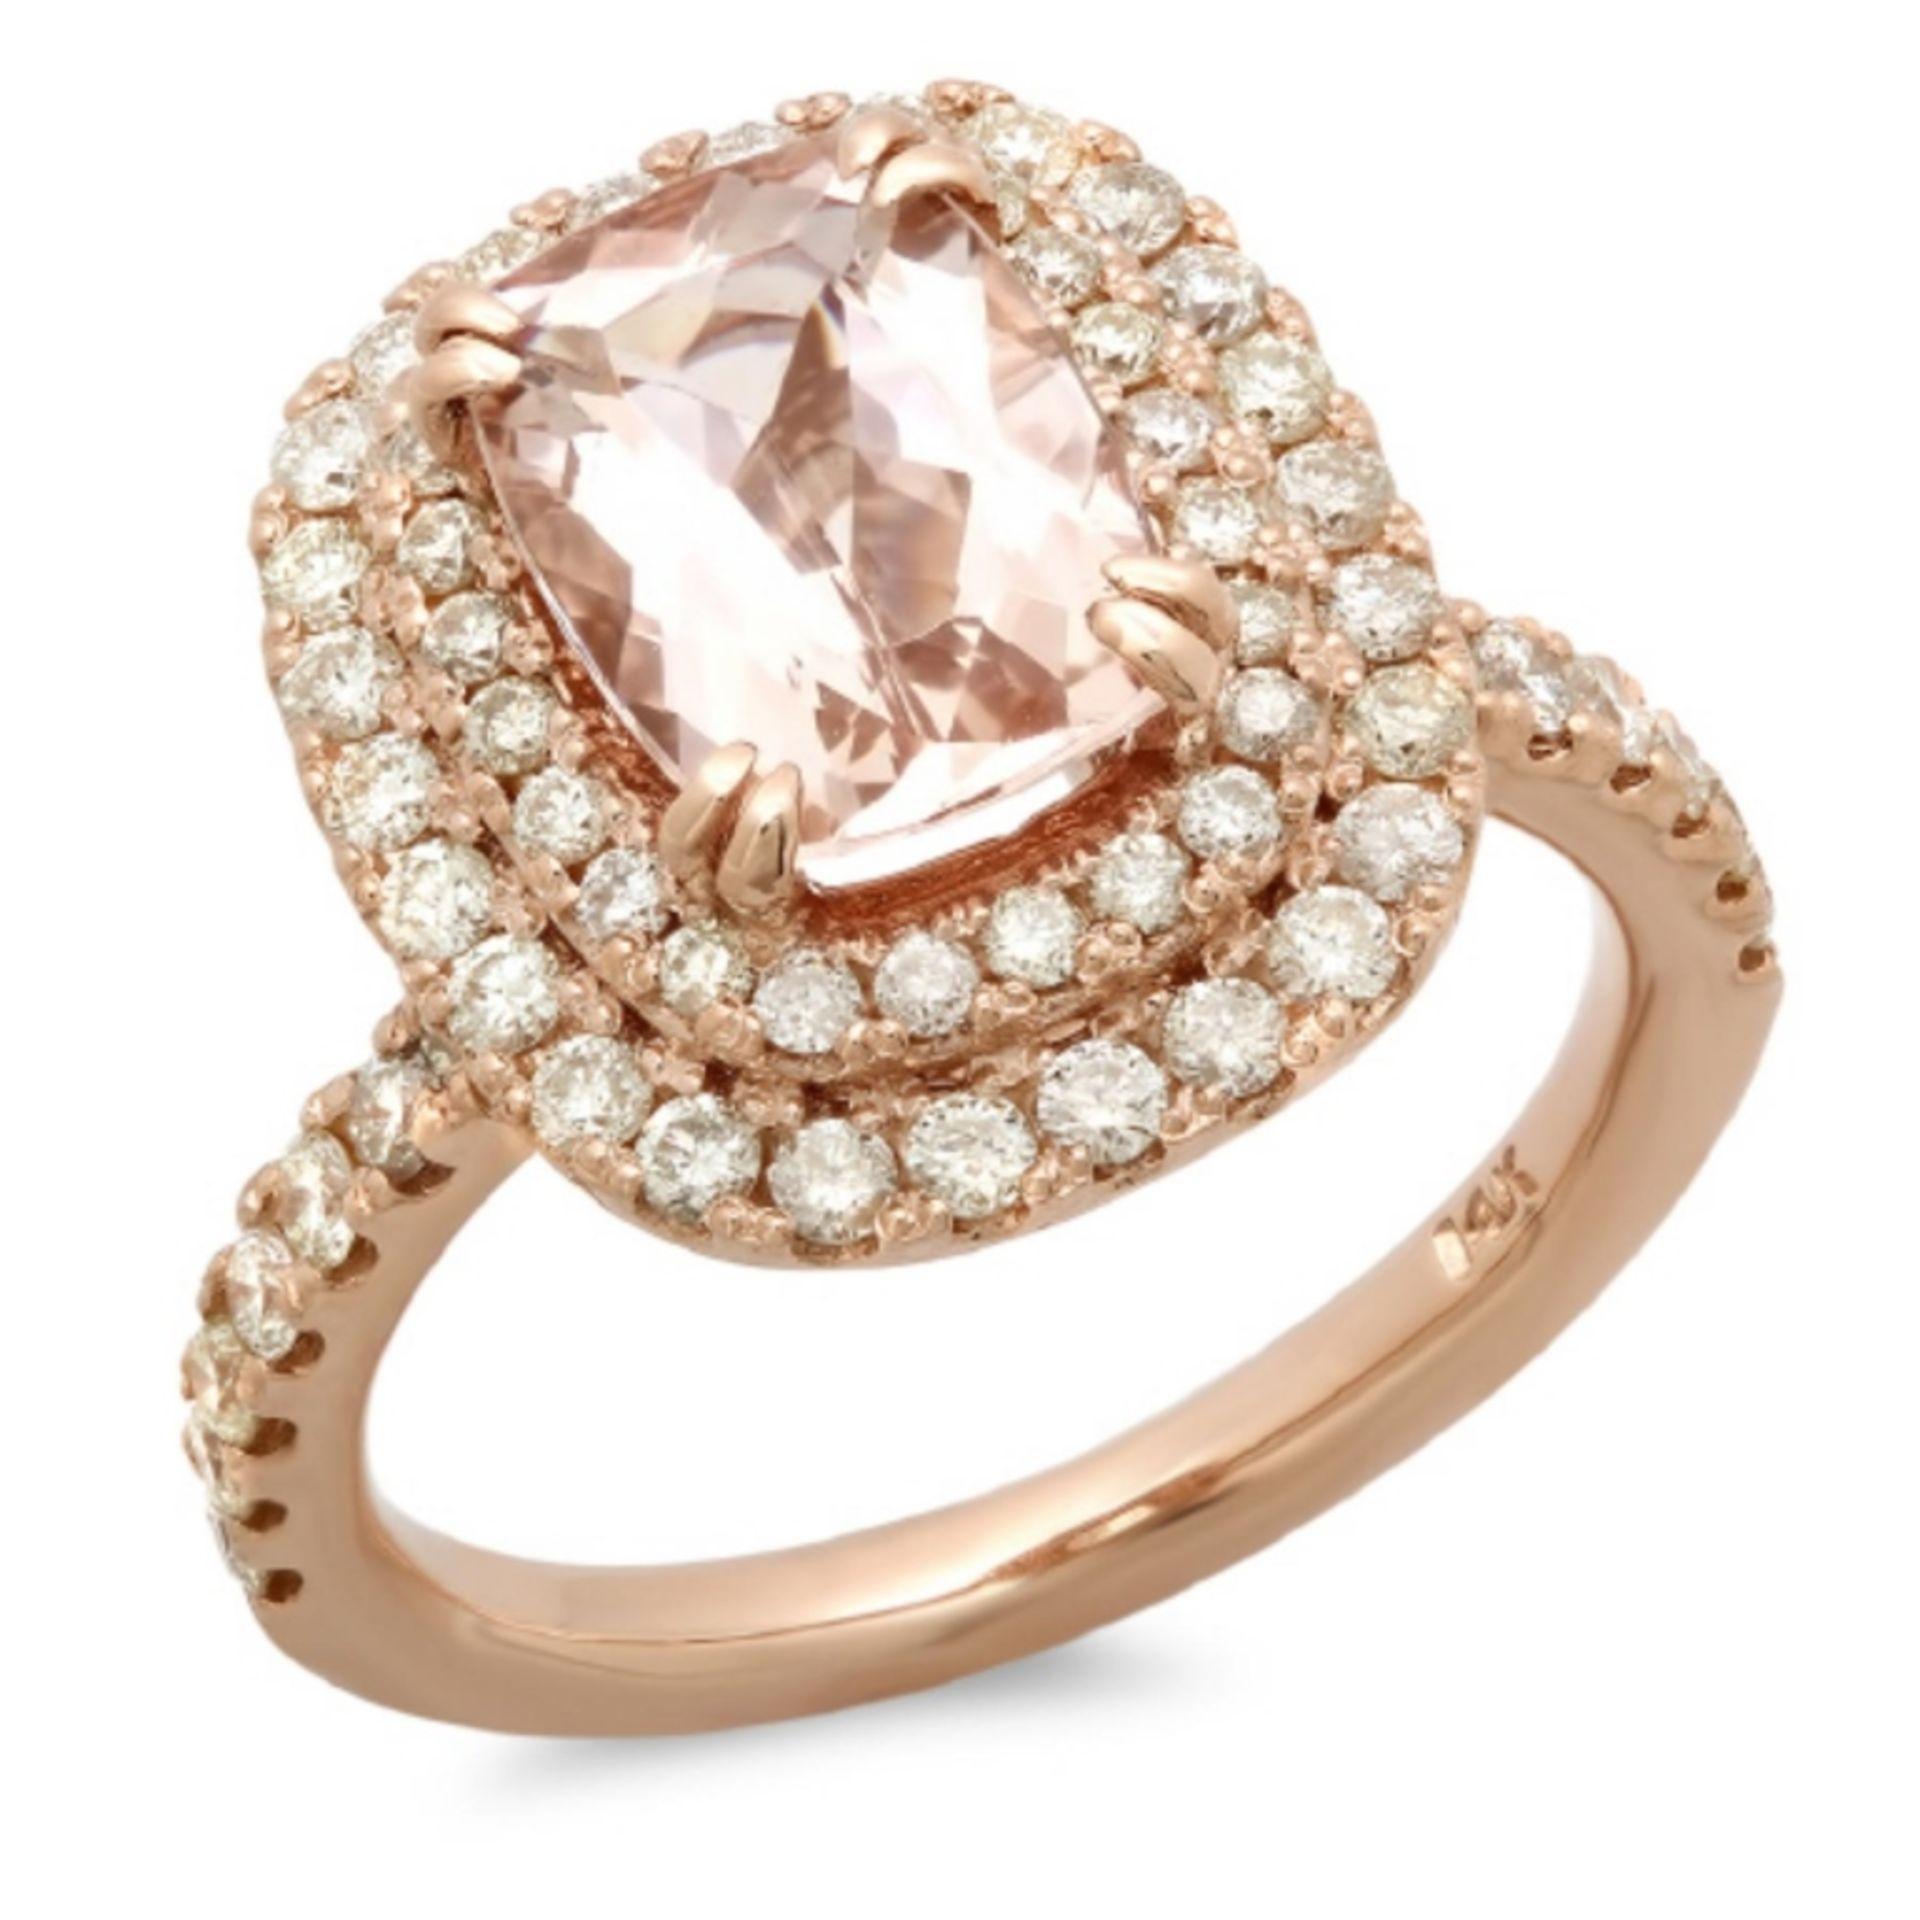 14K Gold 2.00ct Morganite & 1.00ct Diamond Ring